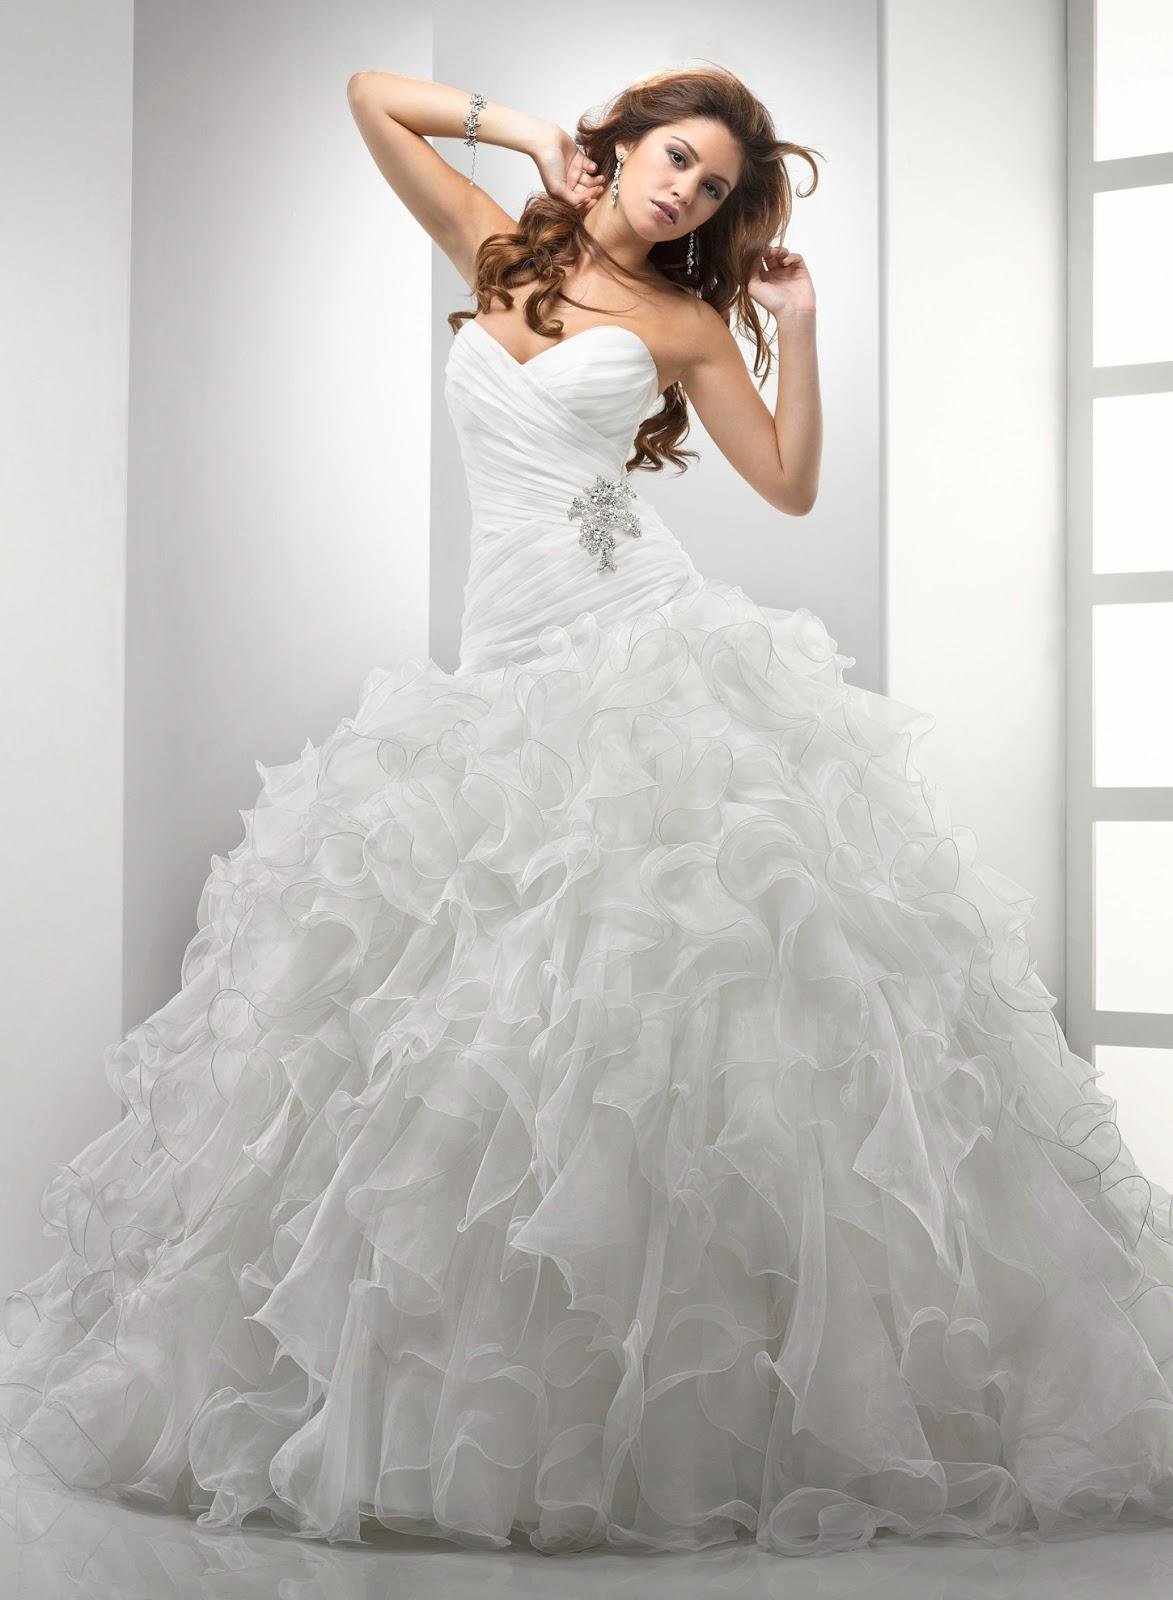 THE WEDDING DRESSES COMPANY: WEDDING DRESSES COMPANY